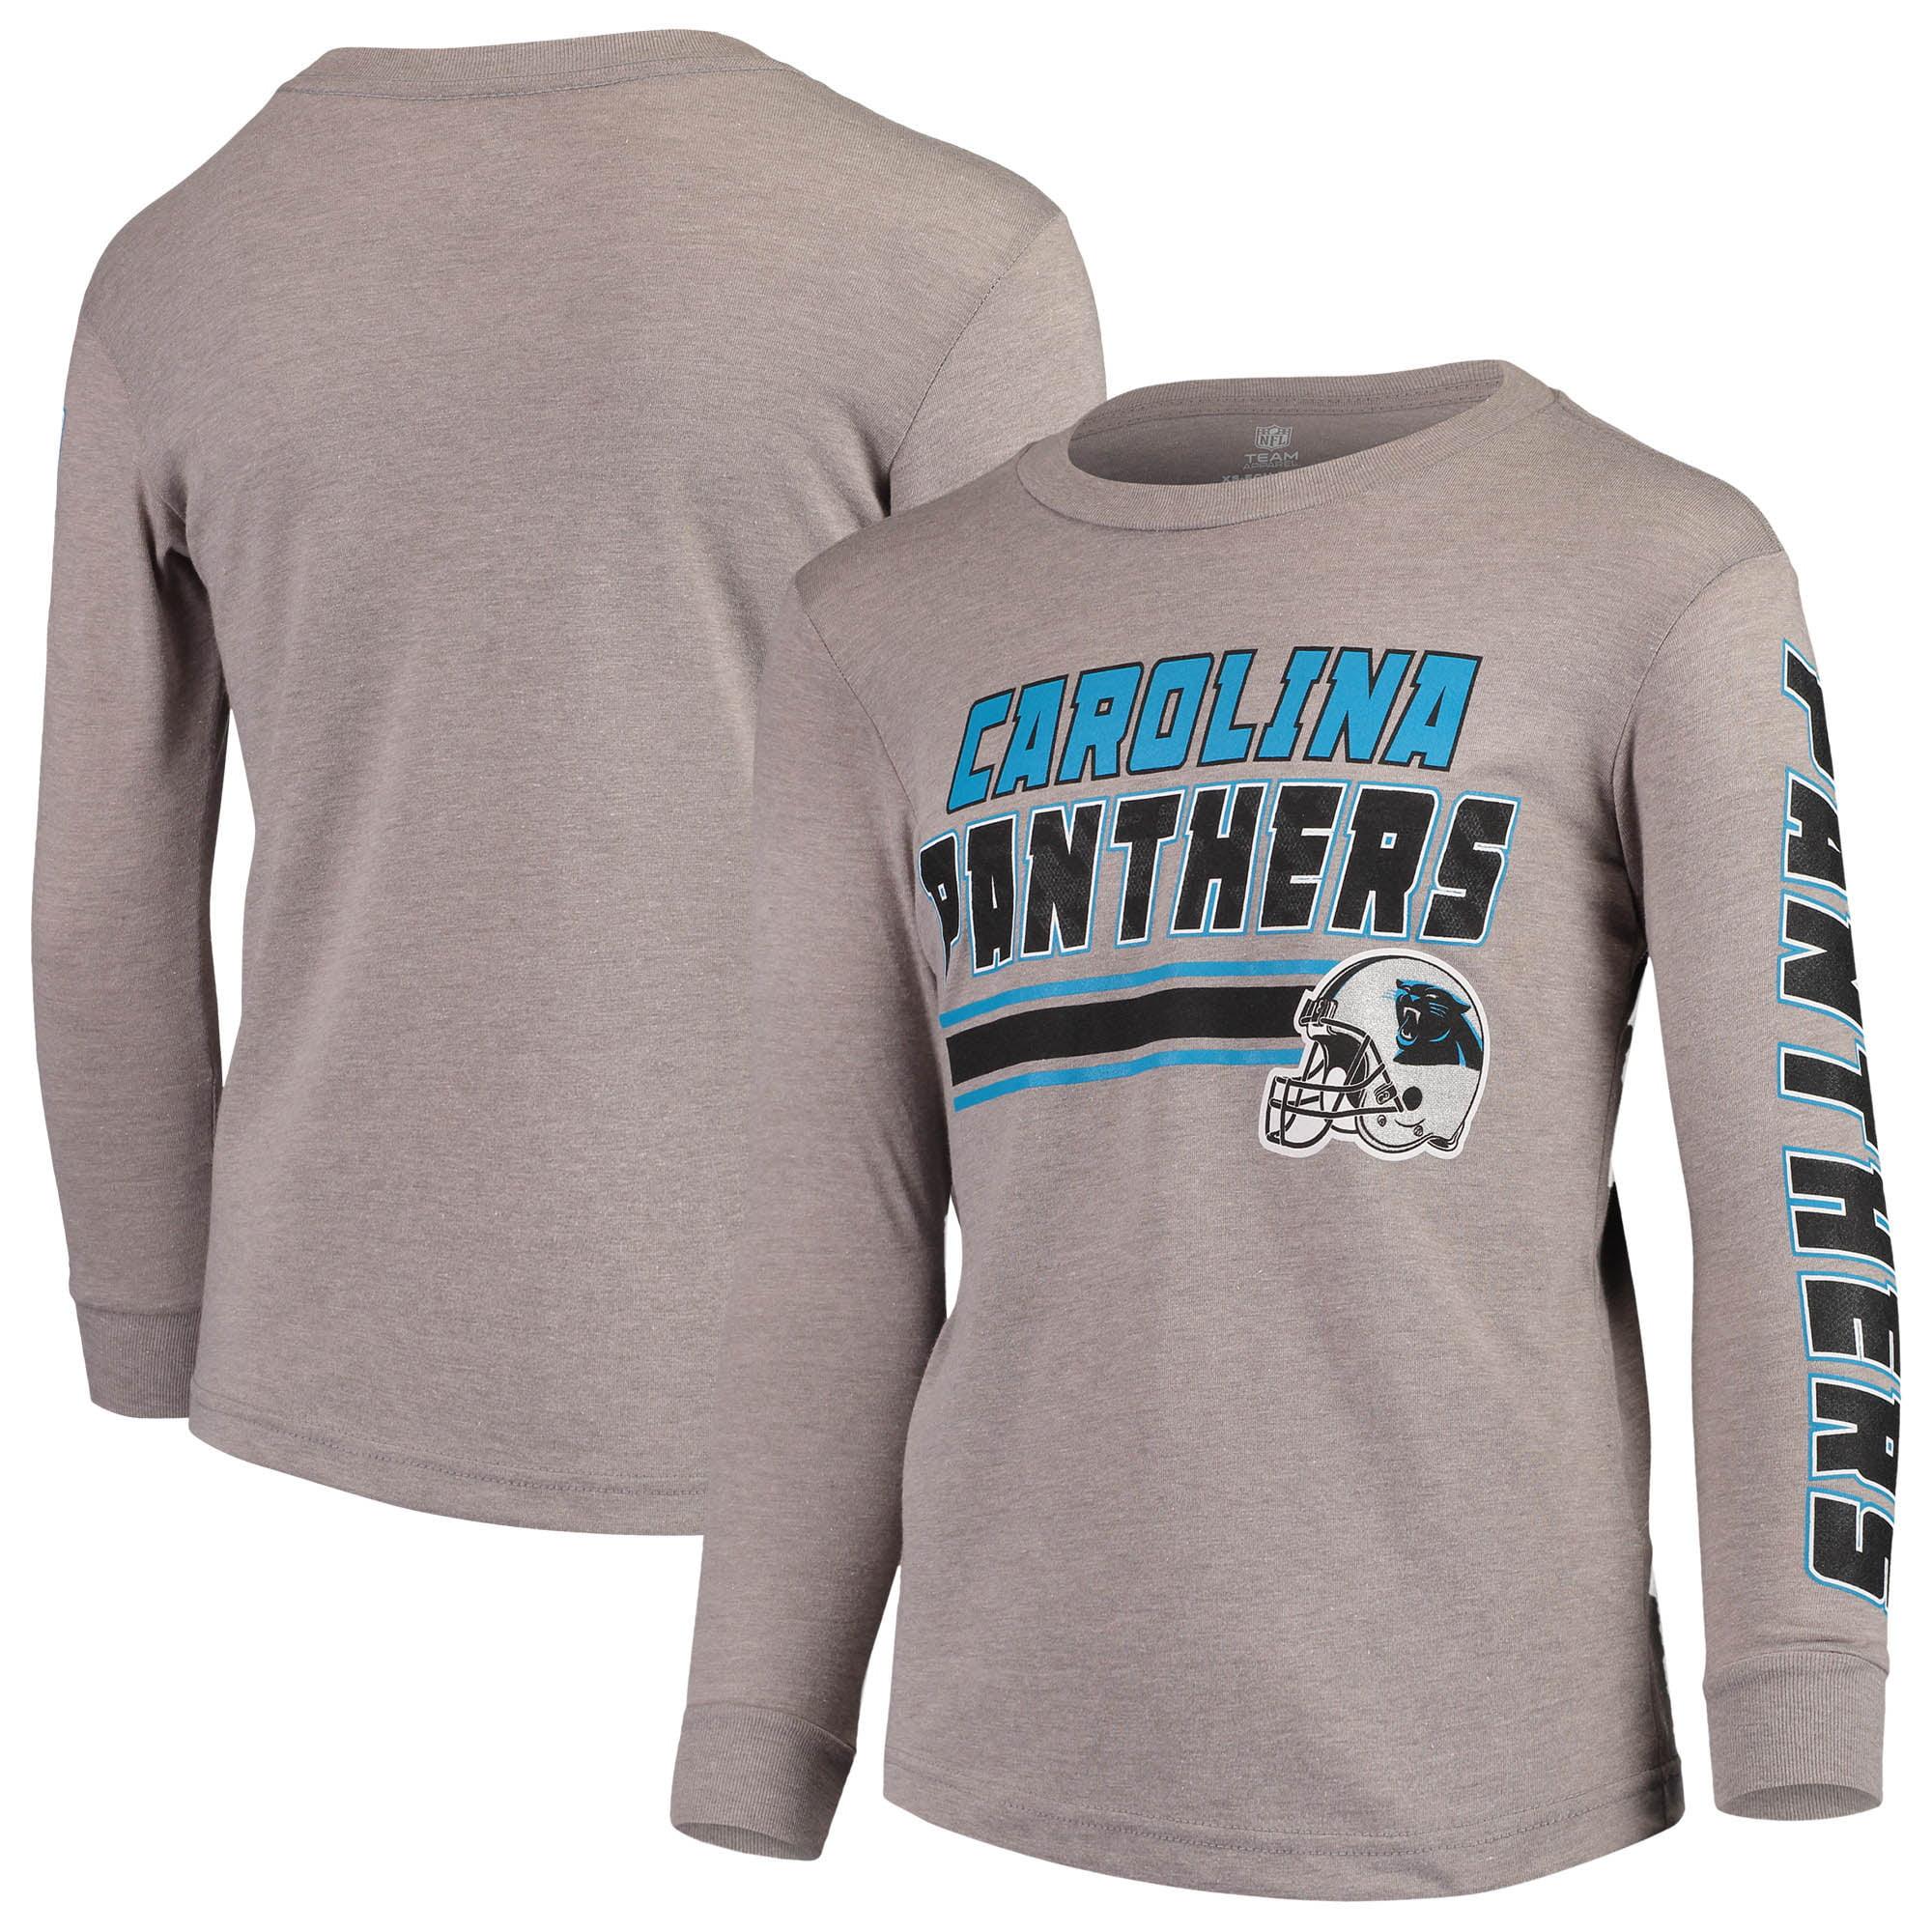 Youth Gray Carolina Panthers Tri-Blend Long Sleeve T-Shirt